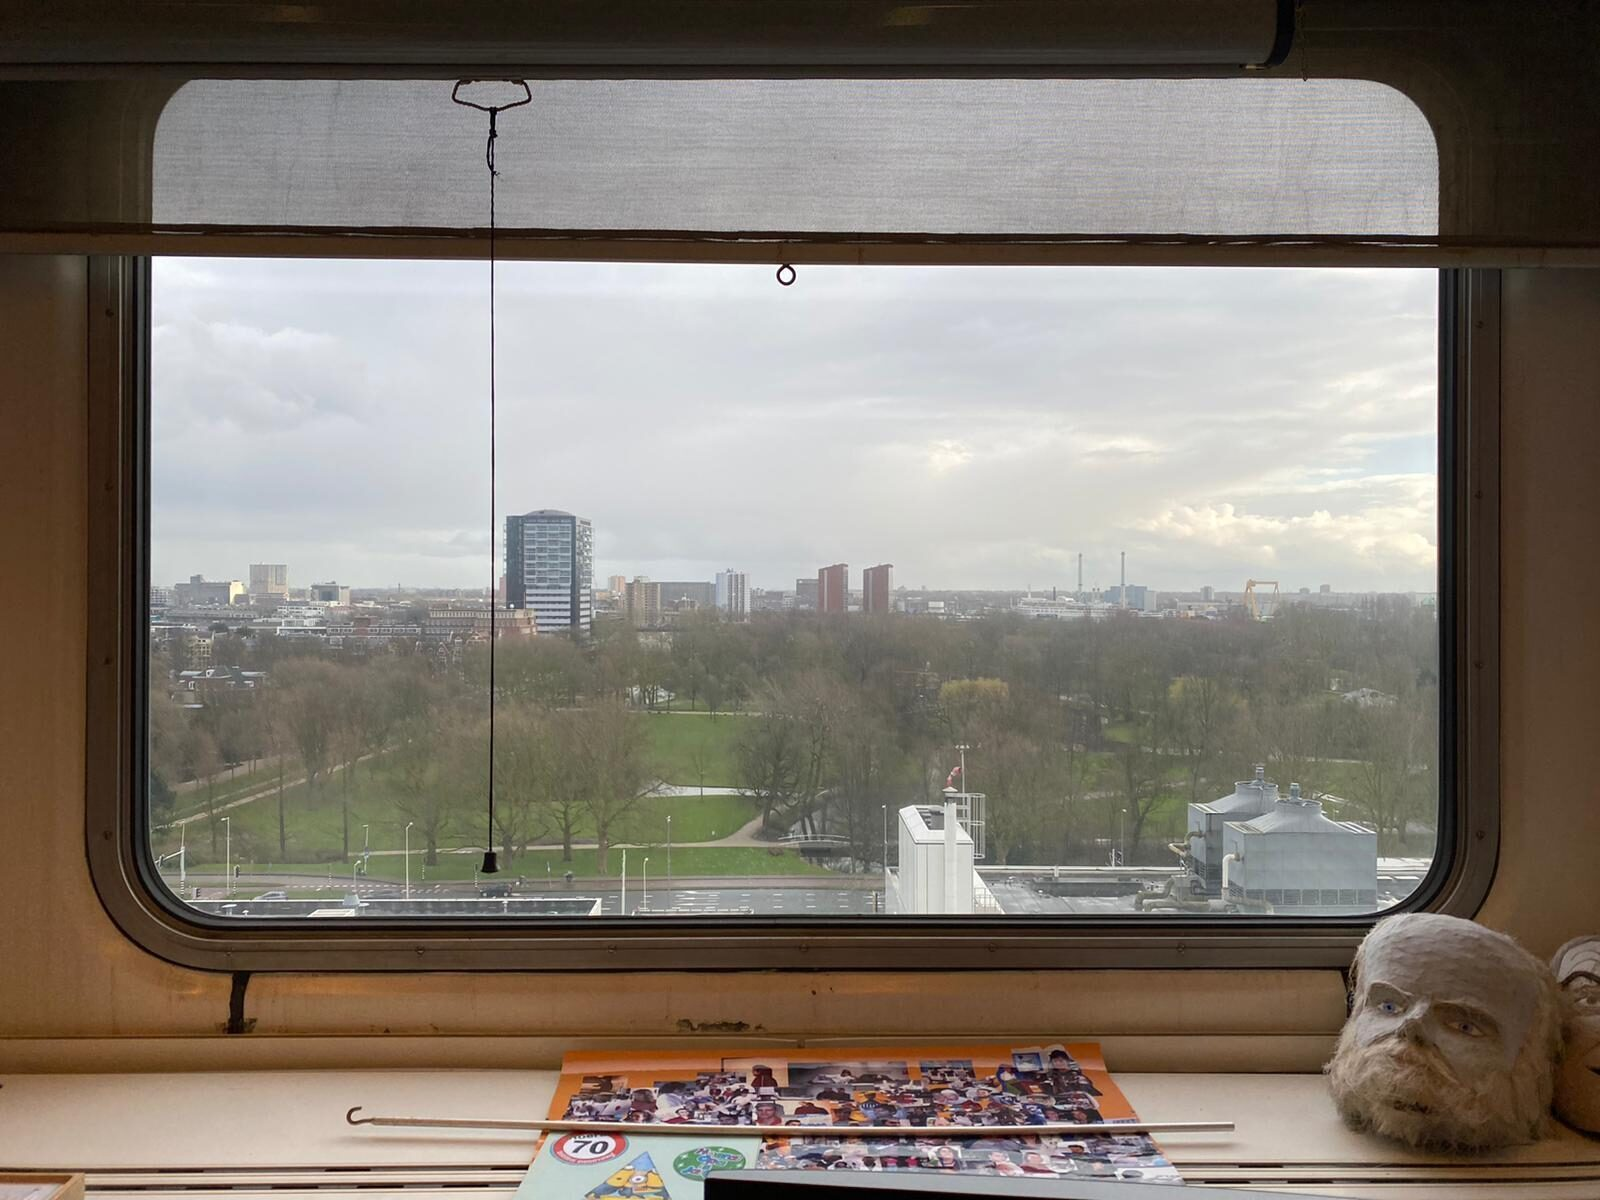 uitzicht laboratorium frank grosveld erasmus mc